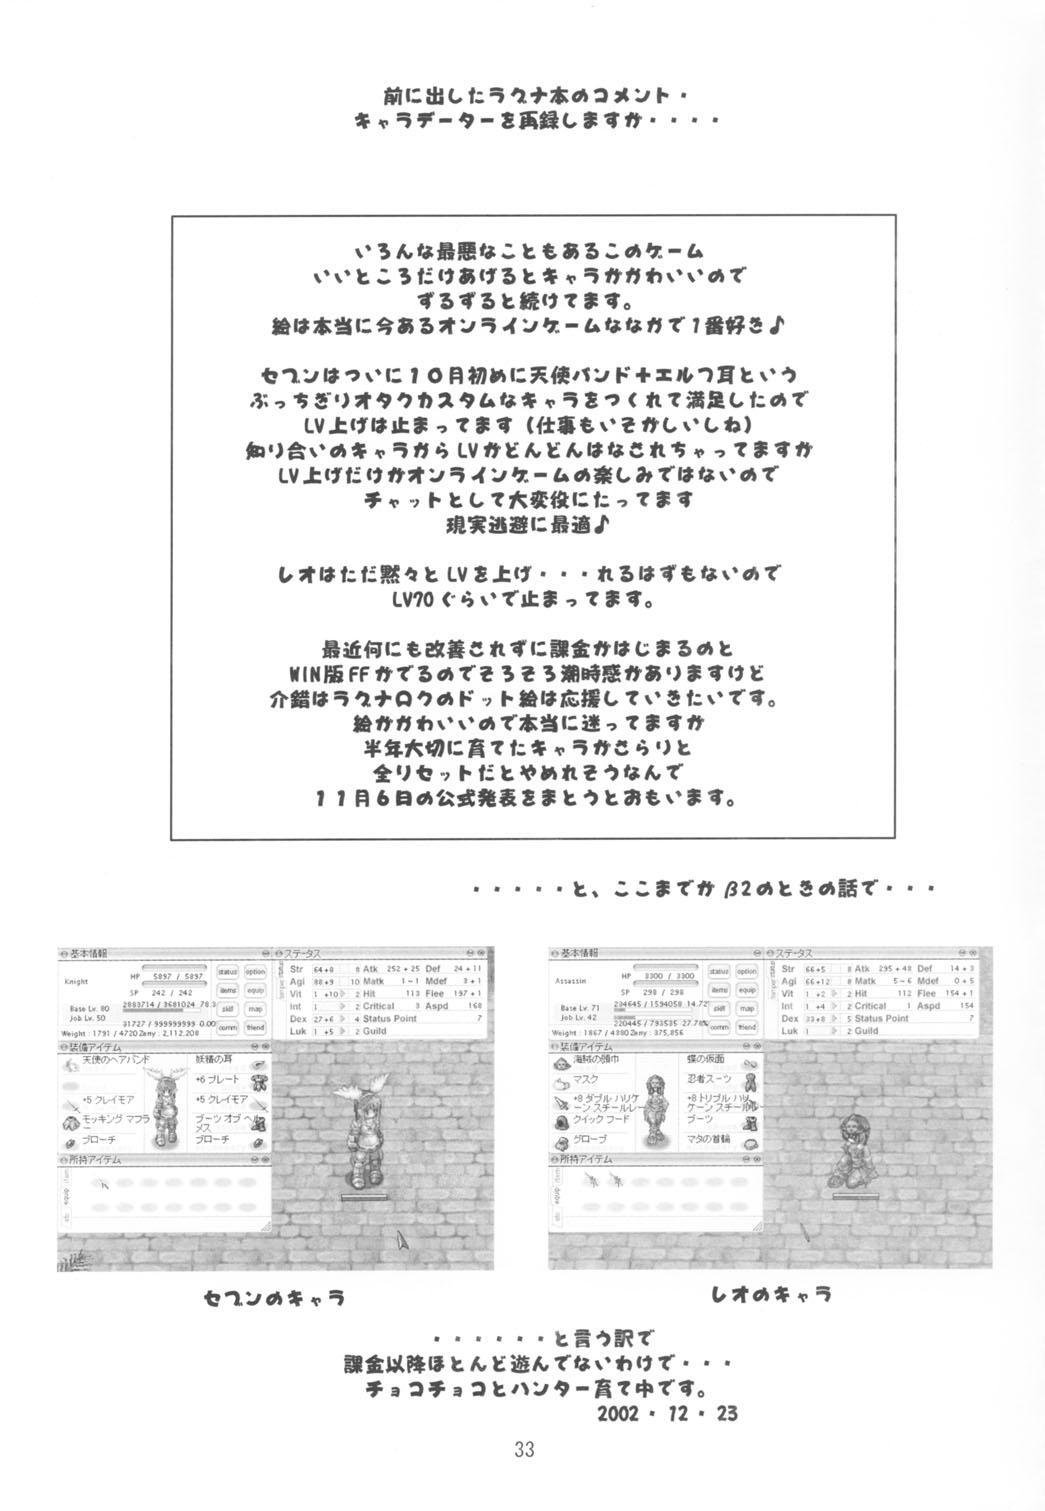 KAISHAKU RAGUNAROK ONLINE 32